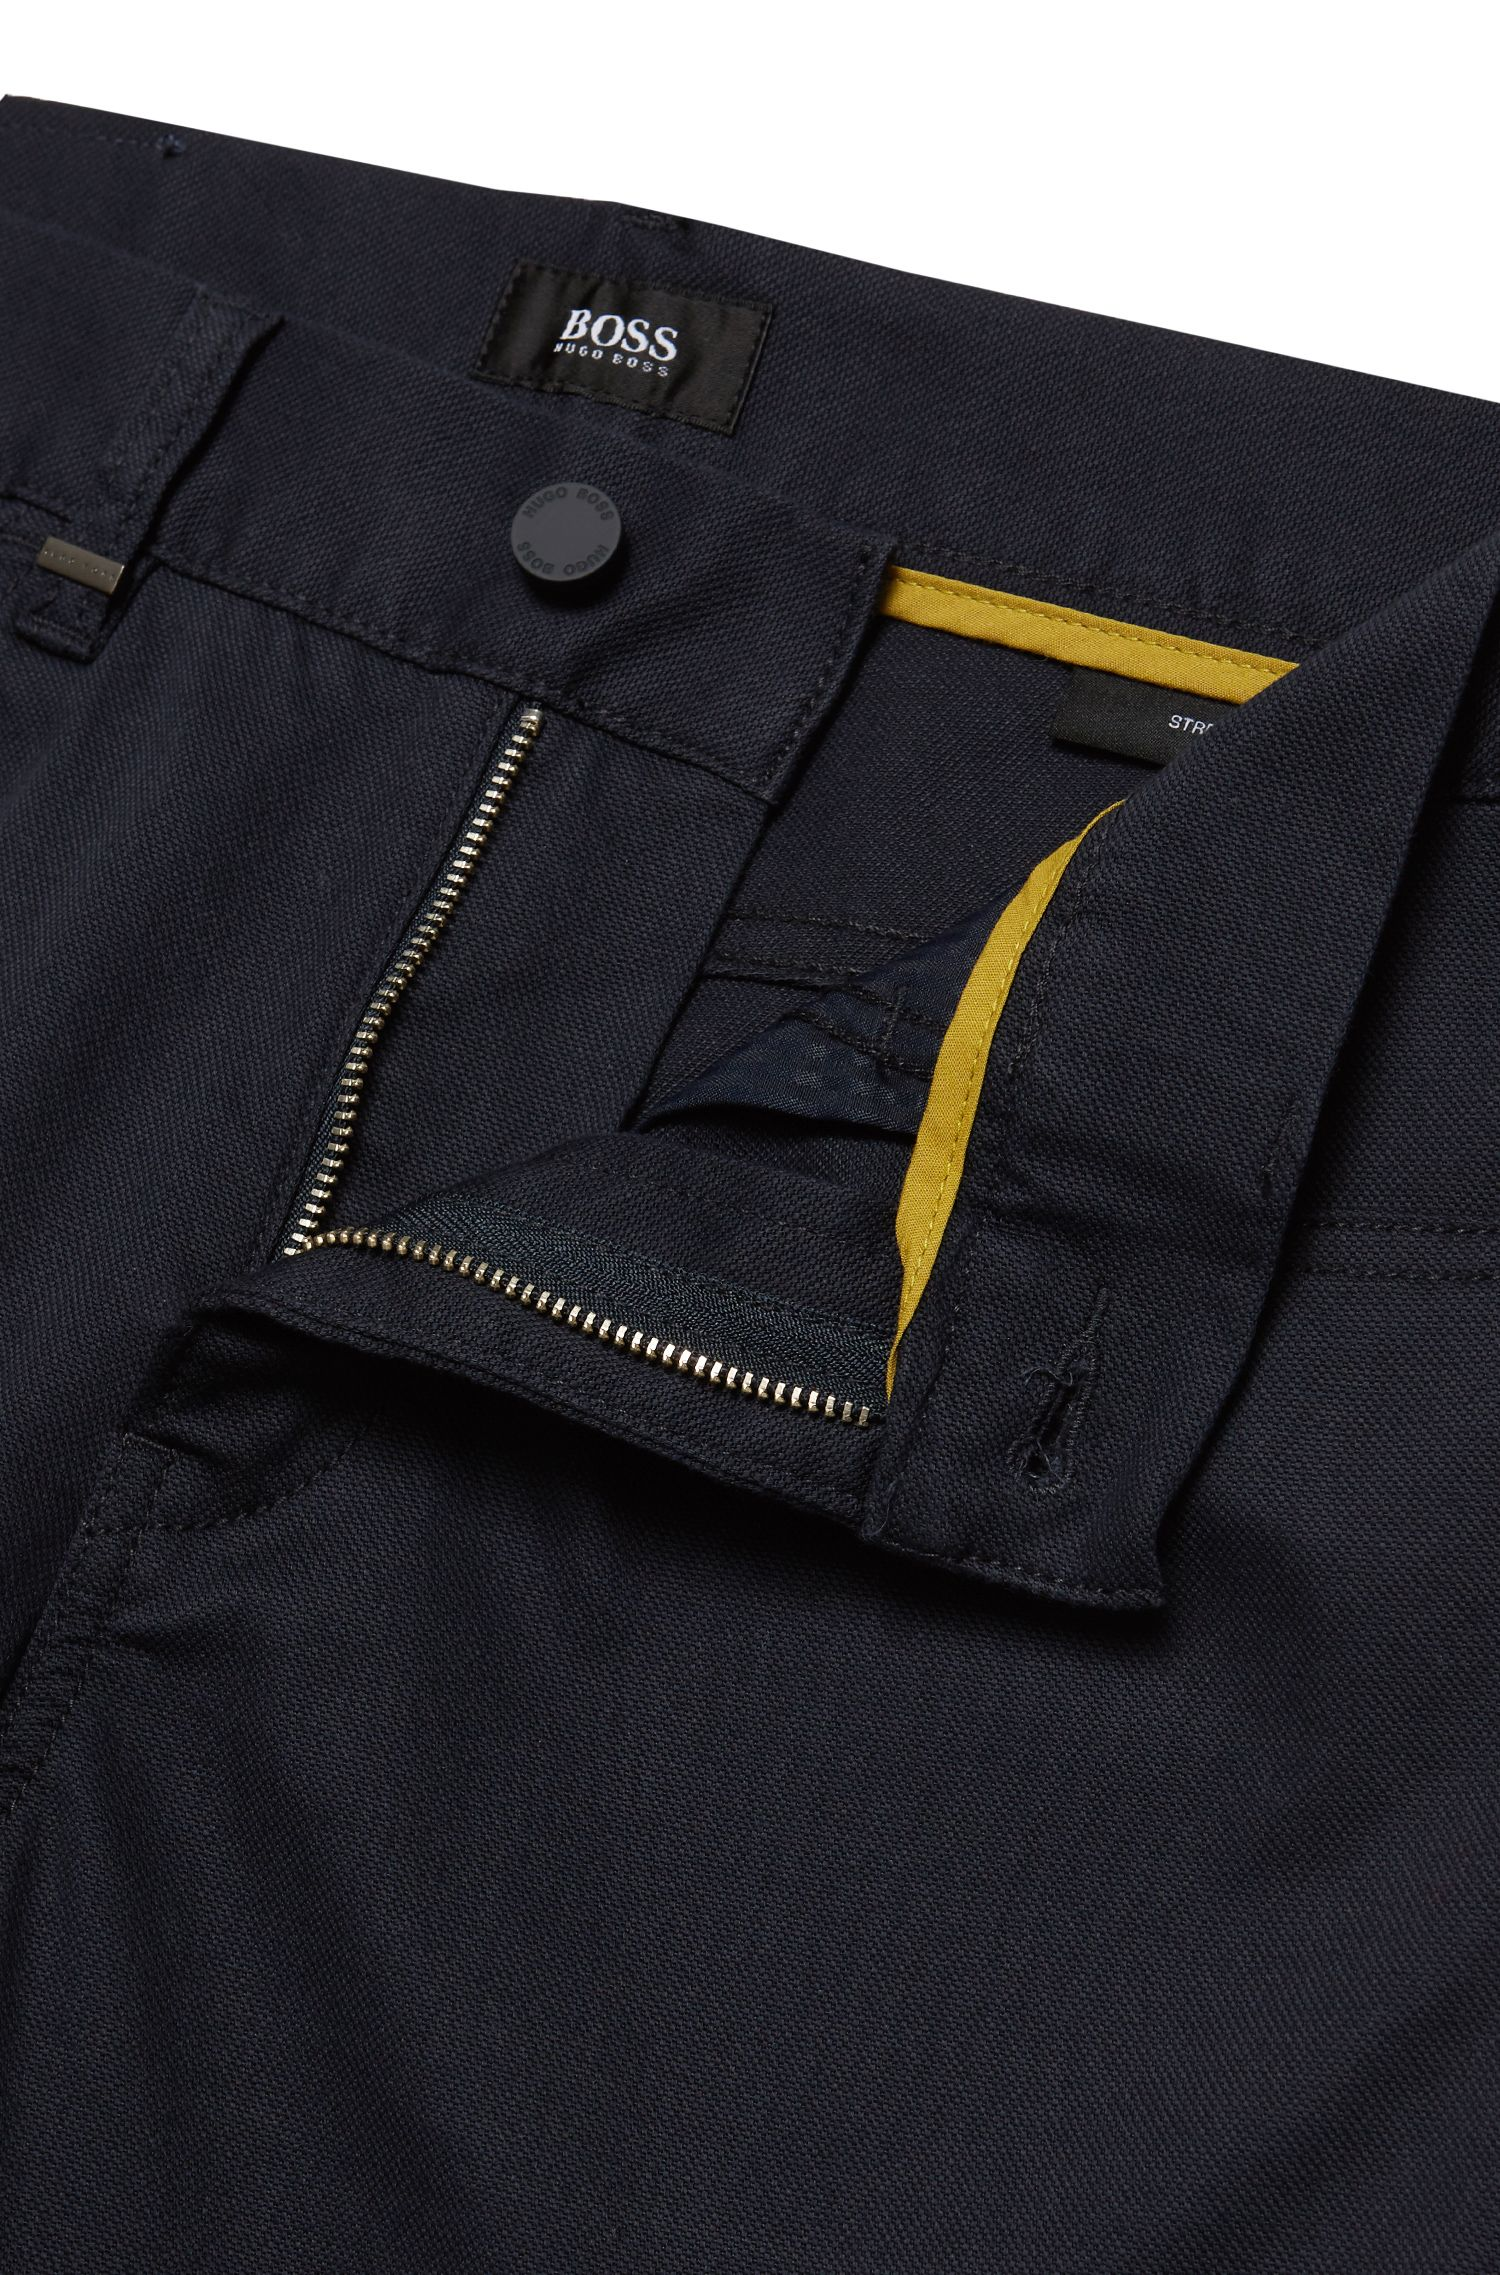 11 oz Stretch Cotton Trouser, Slim Fit | Delaware, Dark Blue